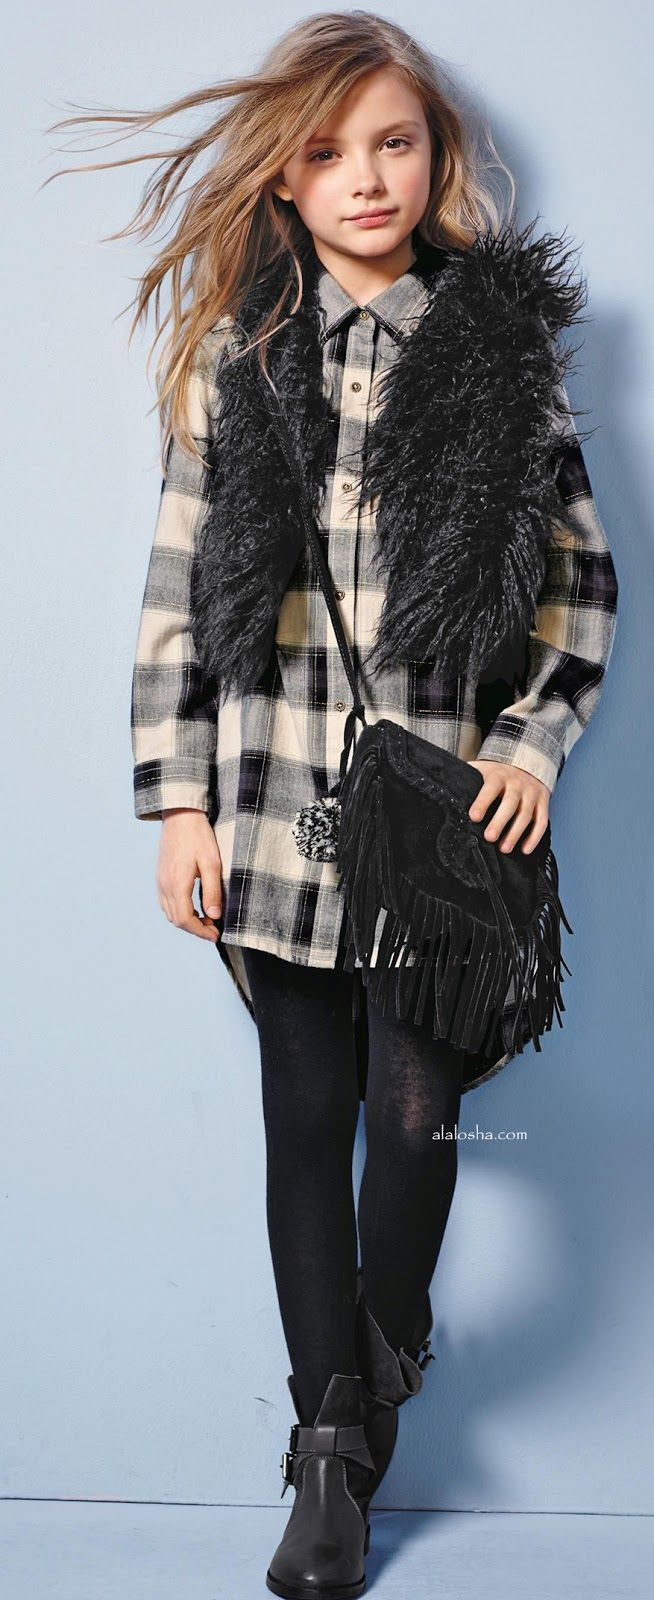 Alalosha Vogue Enfants For A Stylish And Sleek Look Get -5756